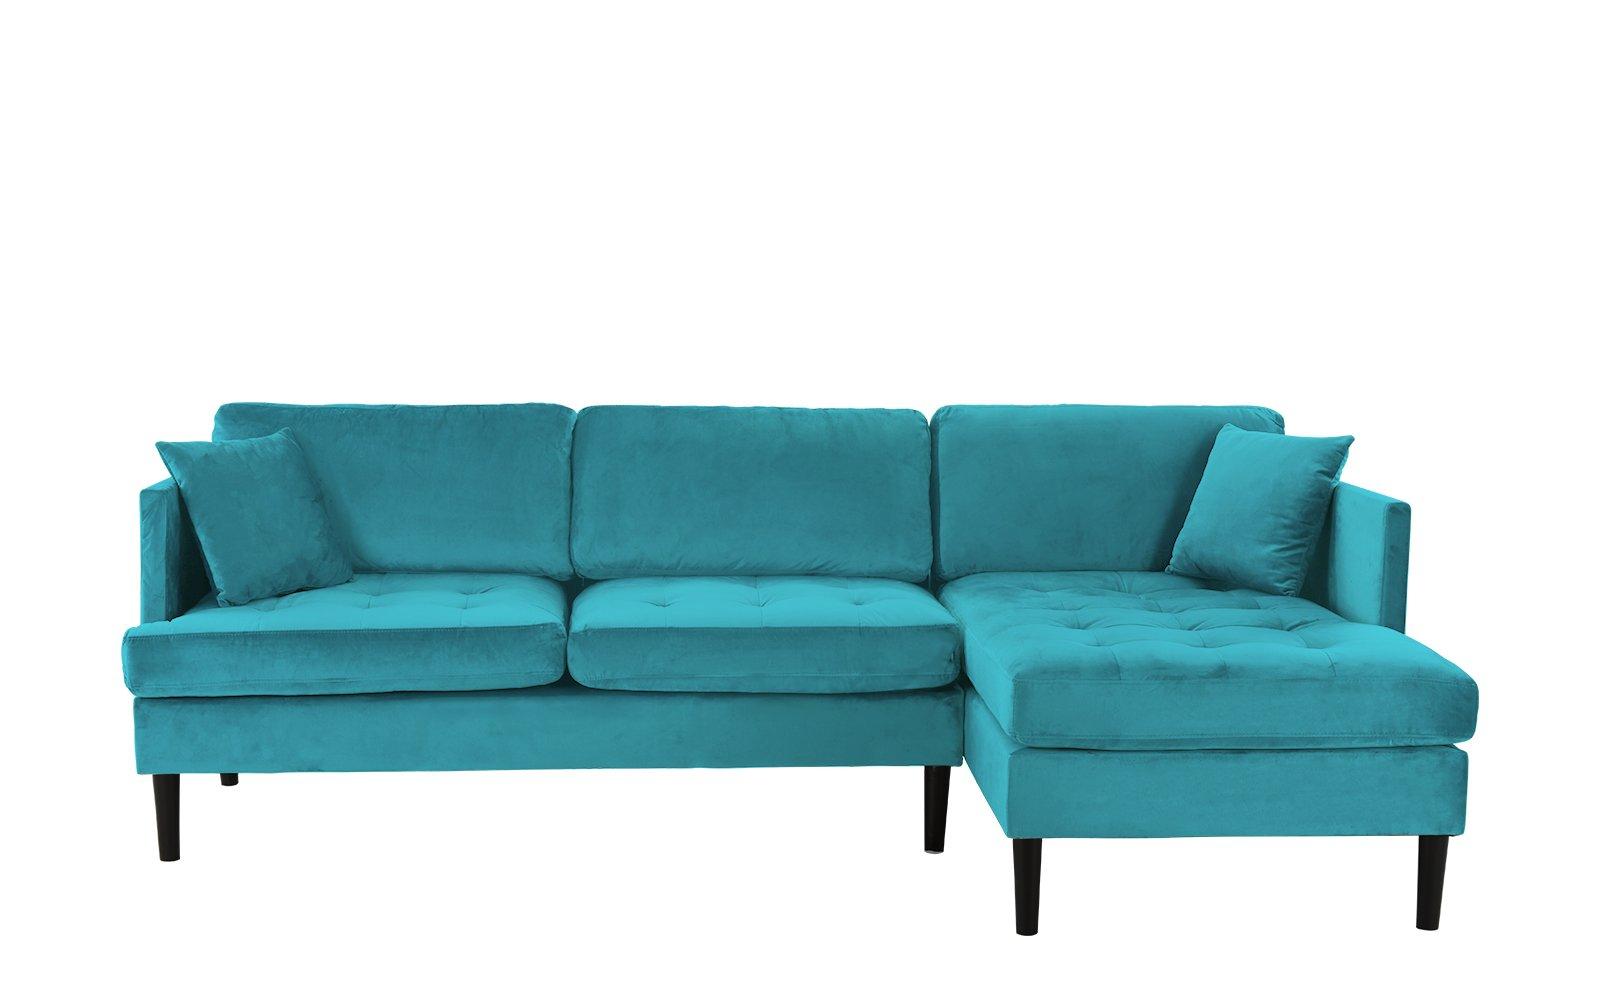 Mid Century Modern Tufted Velvet Sectional Sofa, Classic L Regarding Dulce Mid Century Chaise Sofas Dark Blue (View 3 of 15)